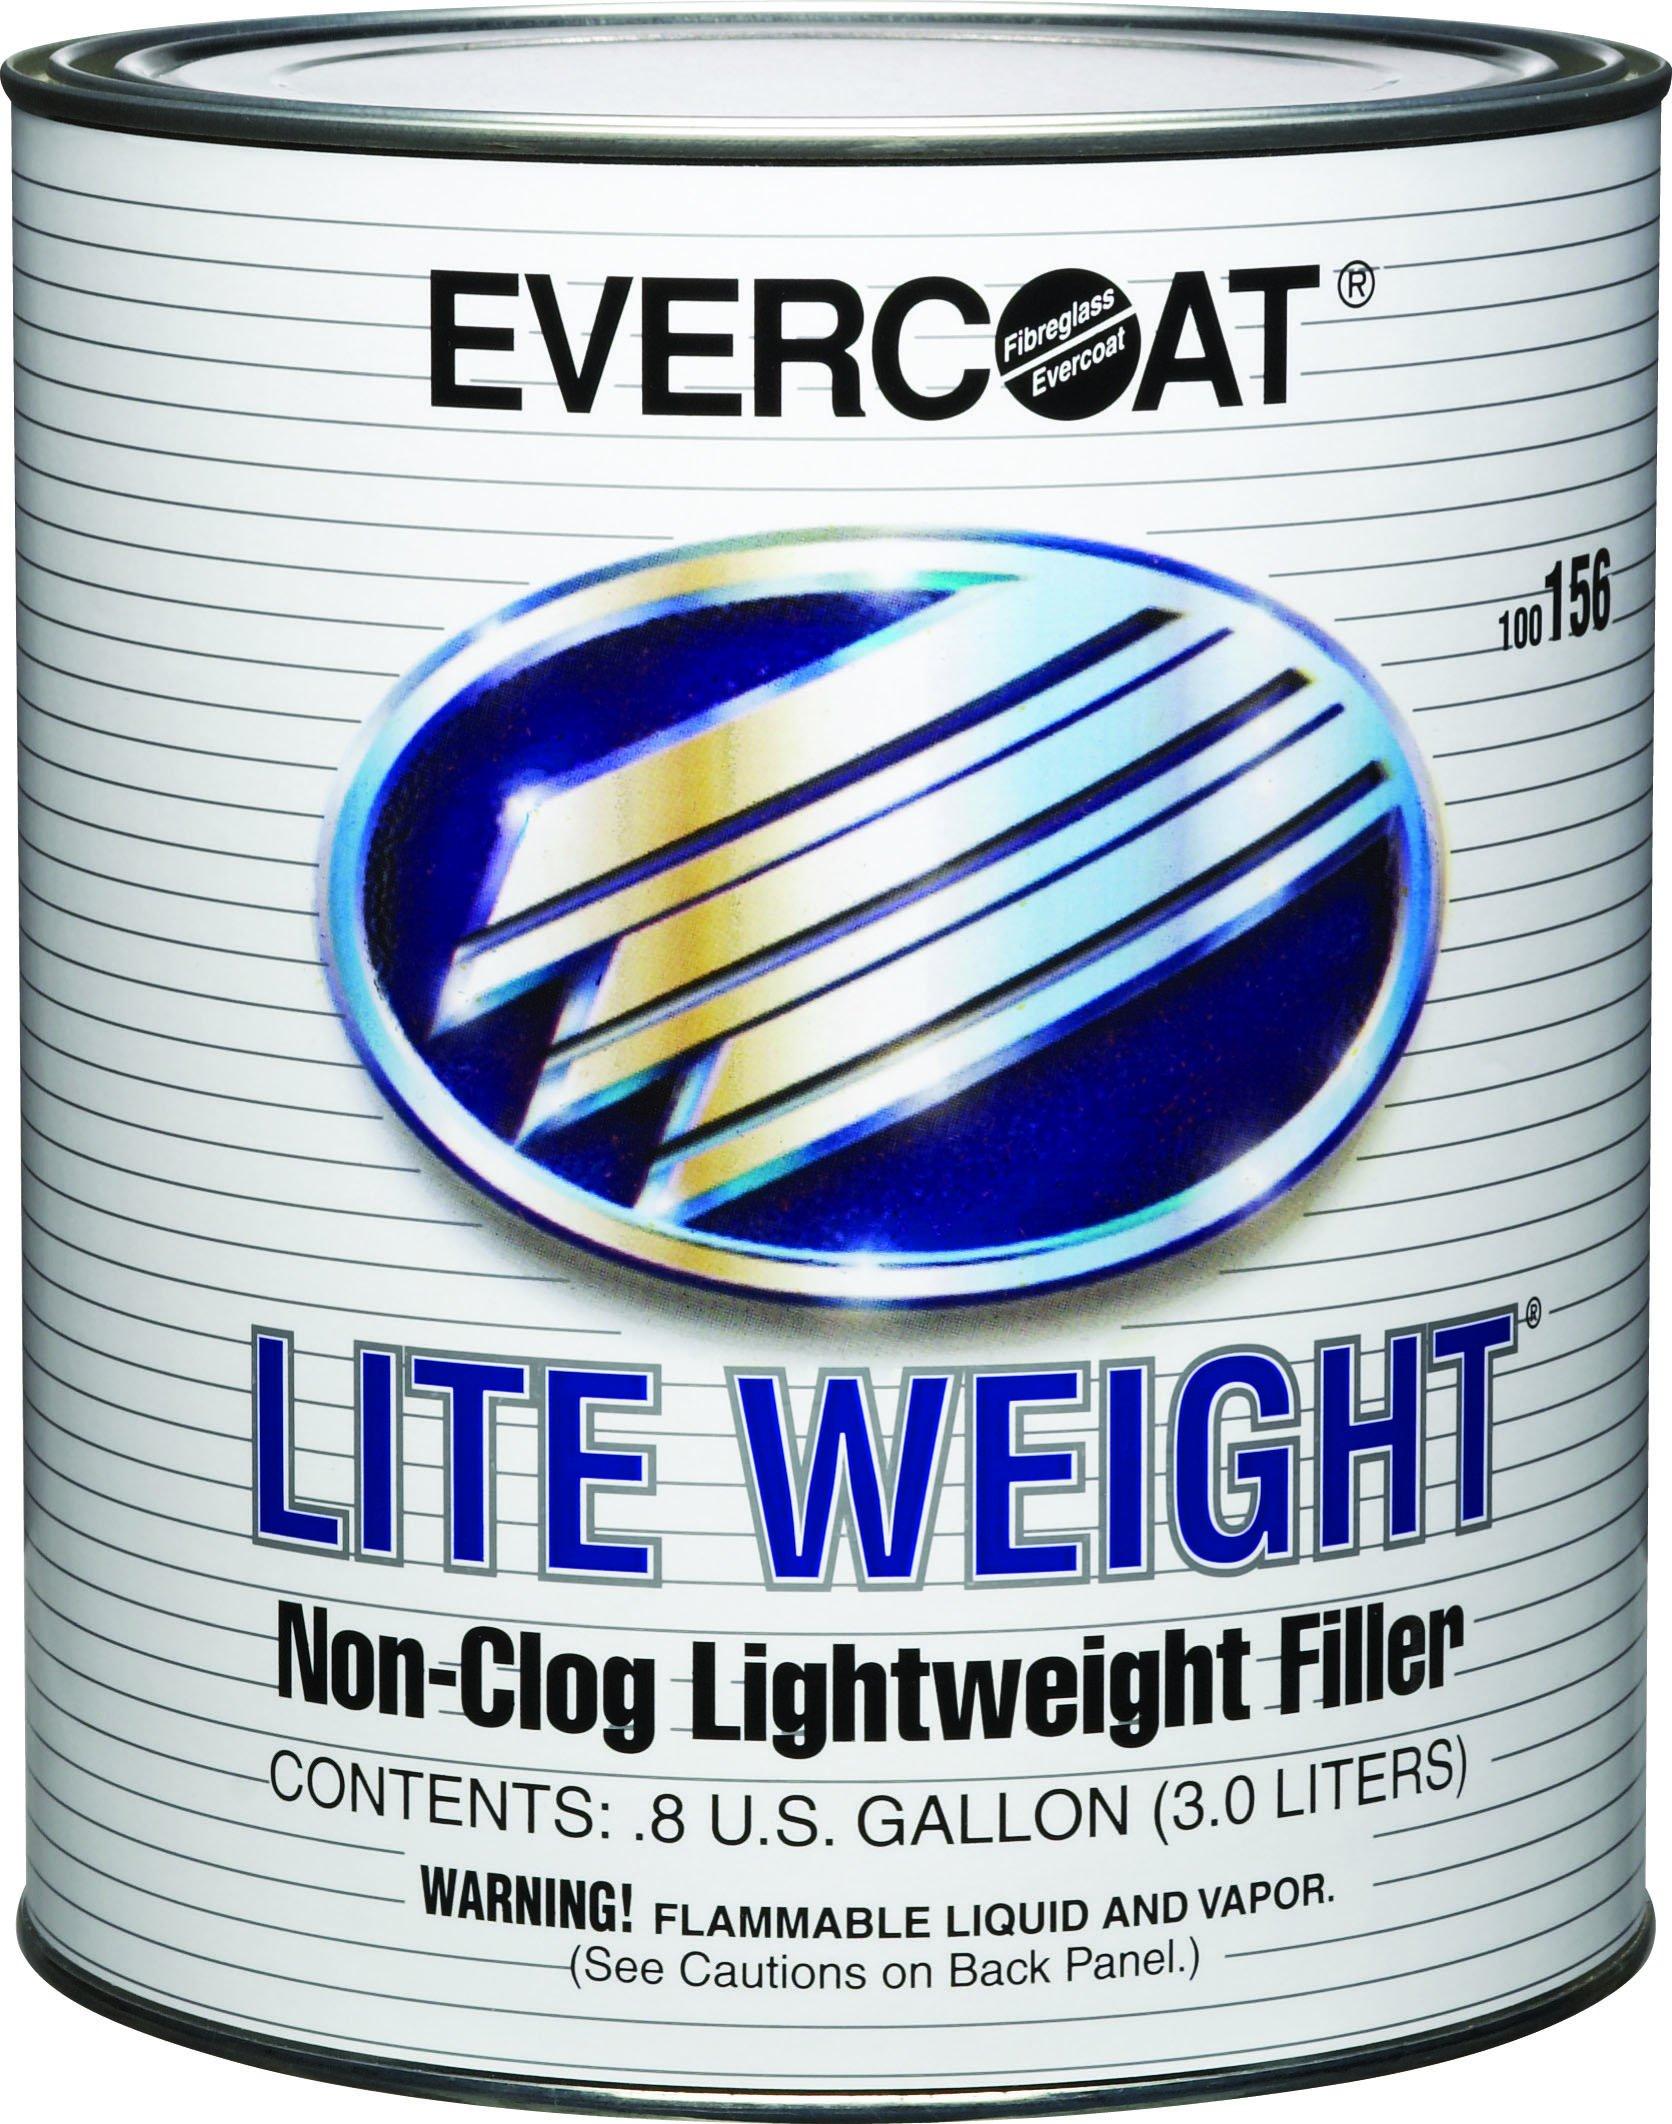 Evercoat 156 Light Weight Body Filler - Gallon by Evercoat (Image #1)